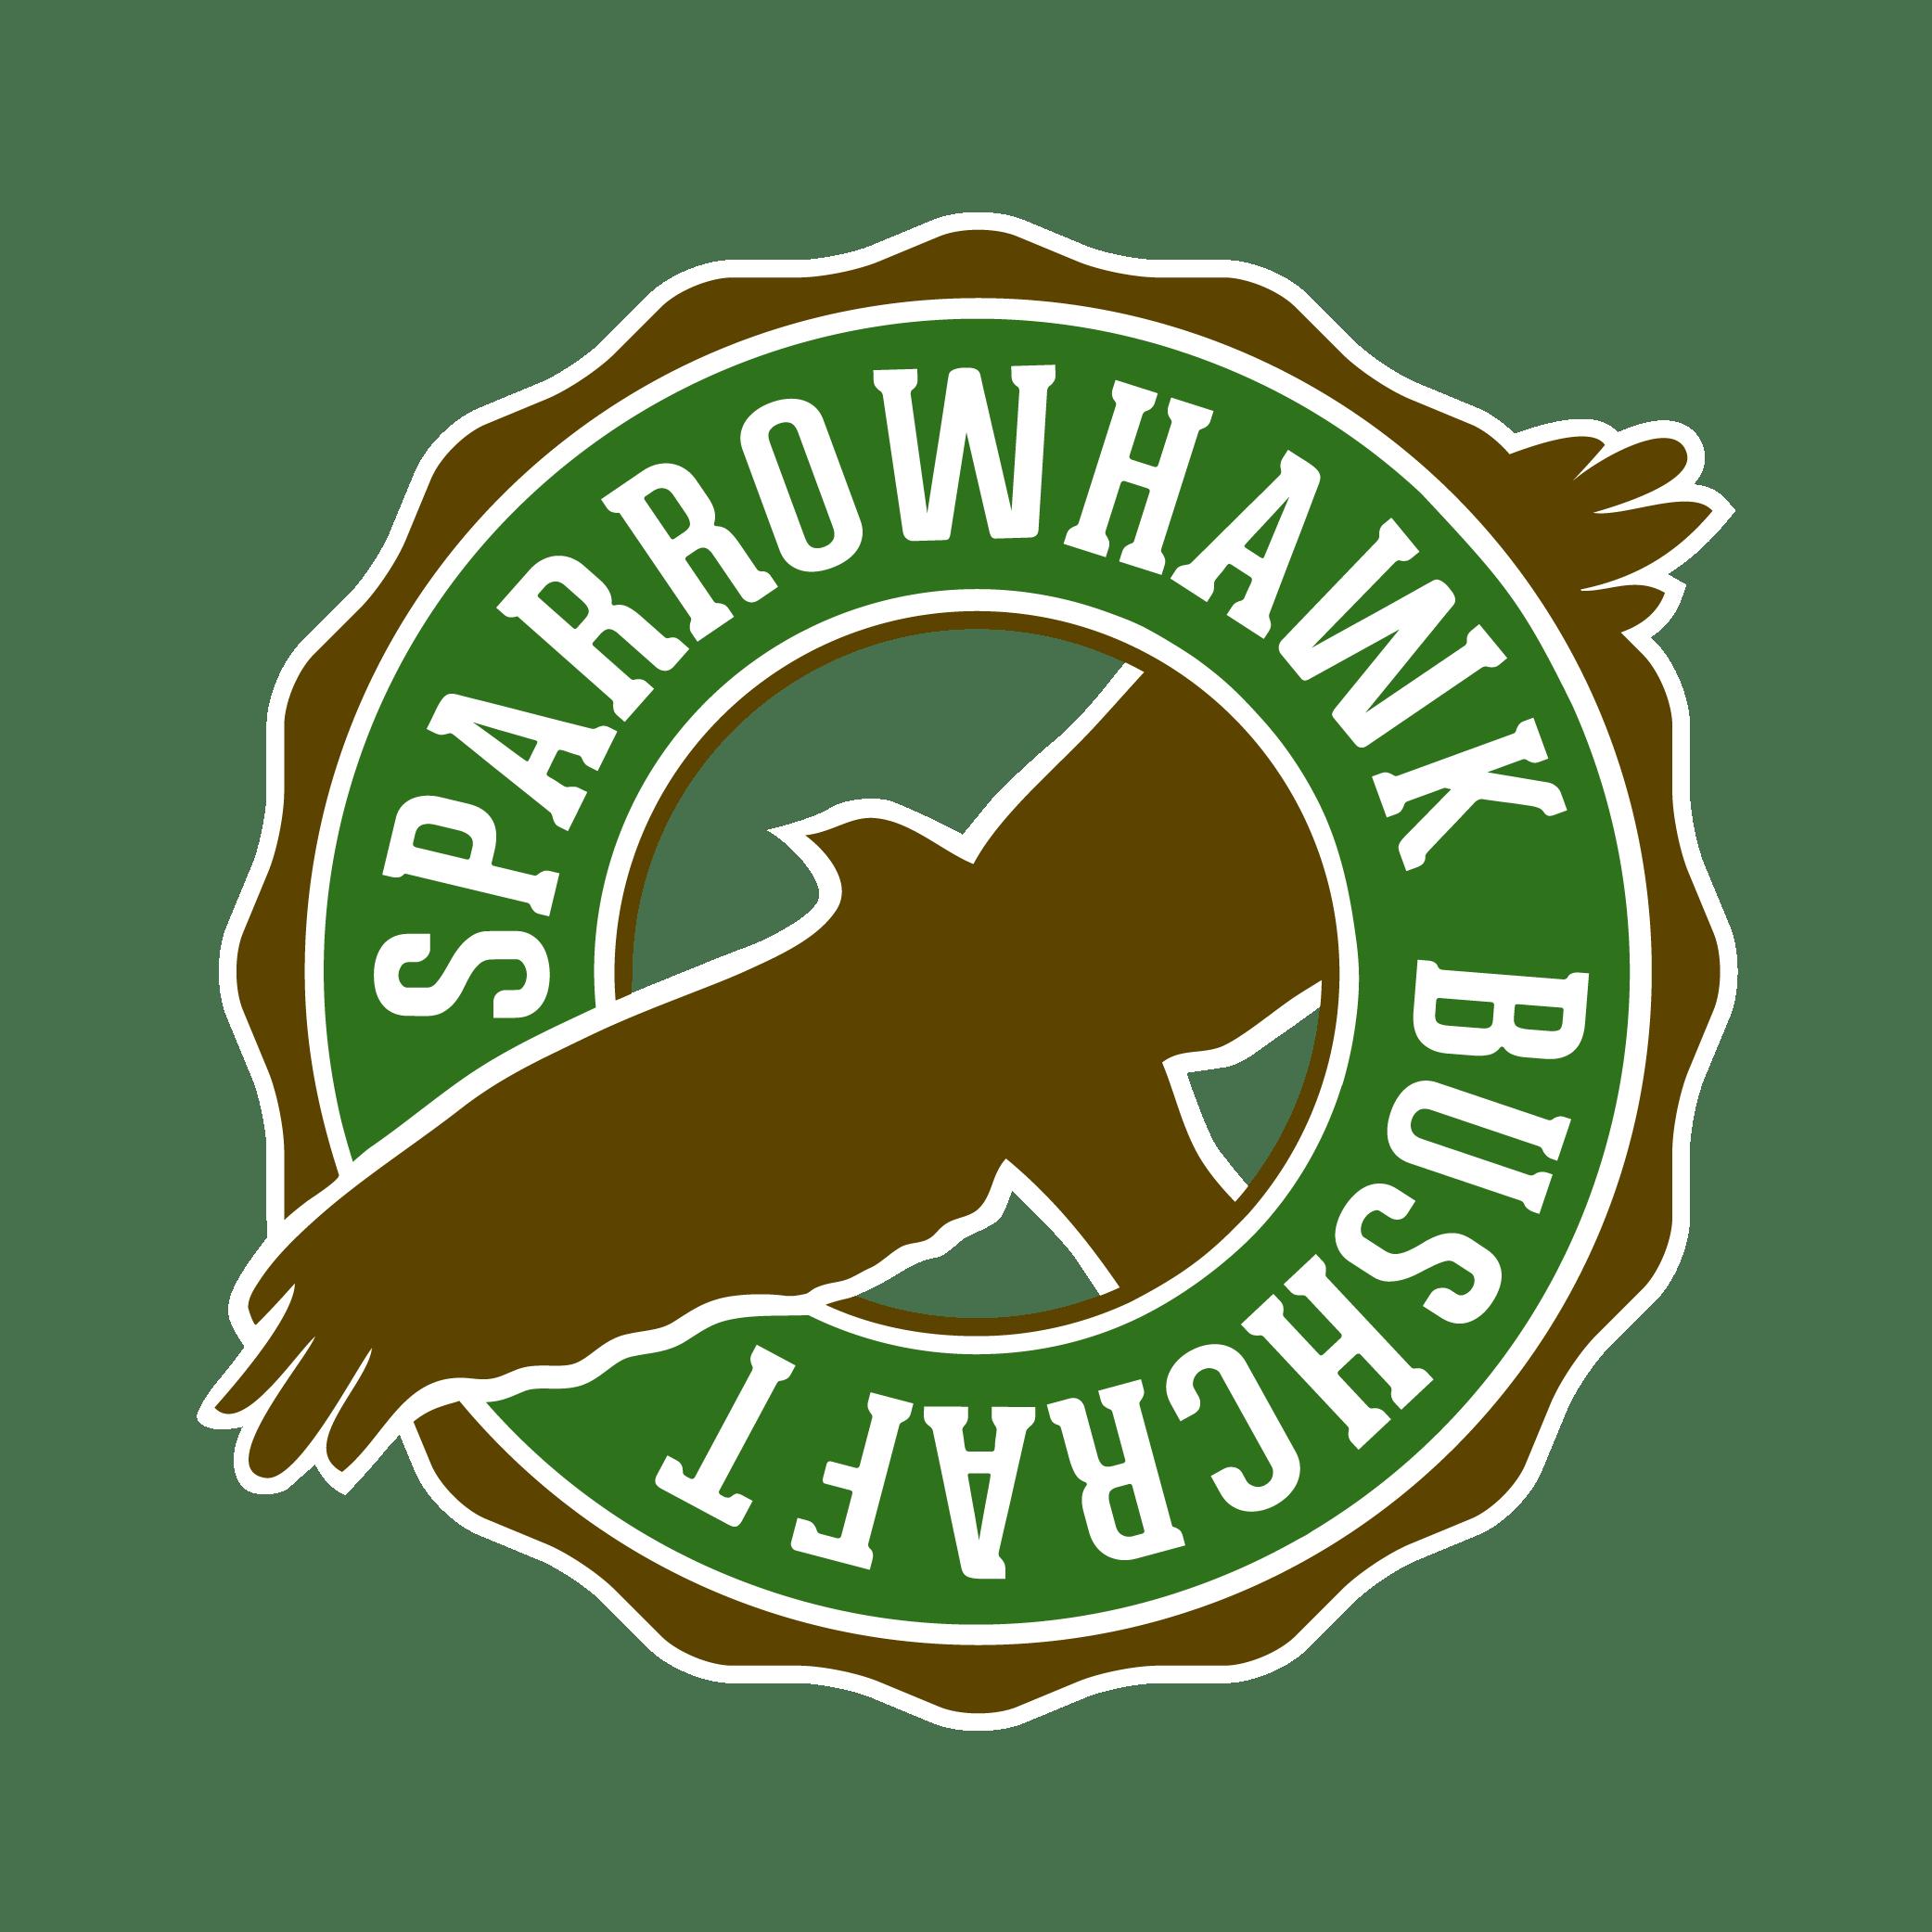 Sparrowhawk Bushcraft